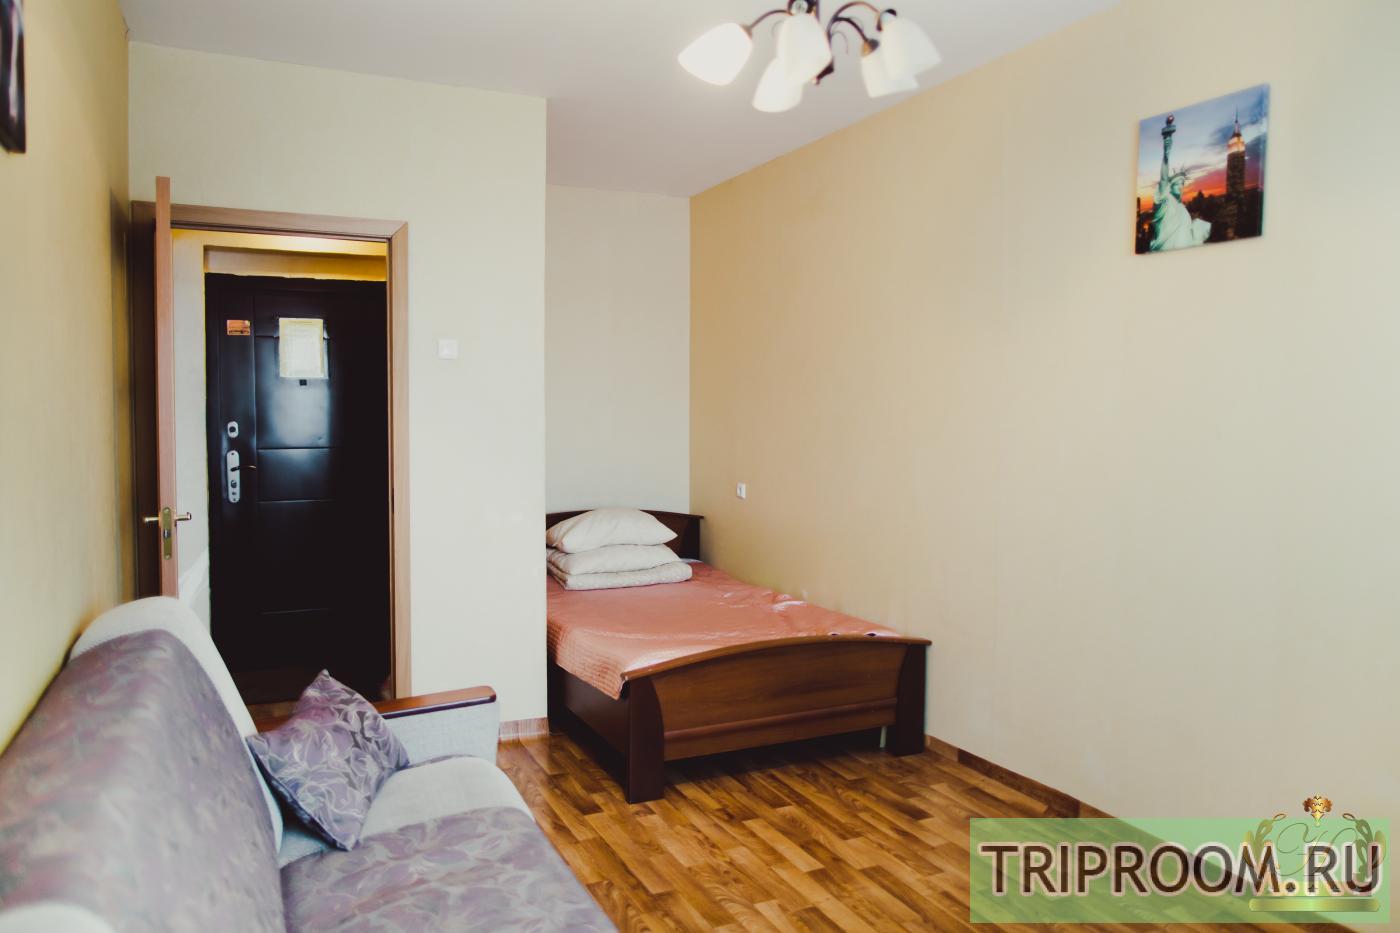 1-комнатная квартира посуточно (вариант № 11398), ул. Алексеева улица, фото № 2